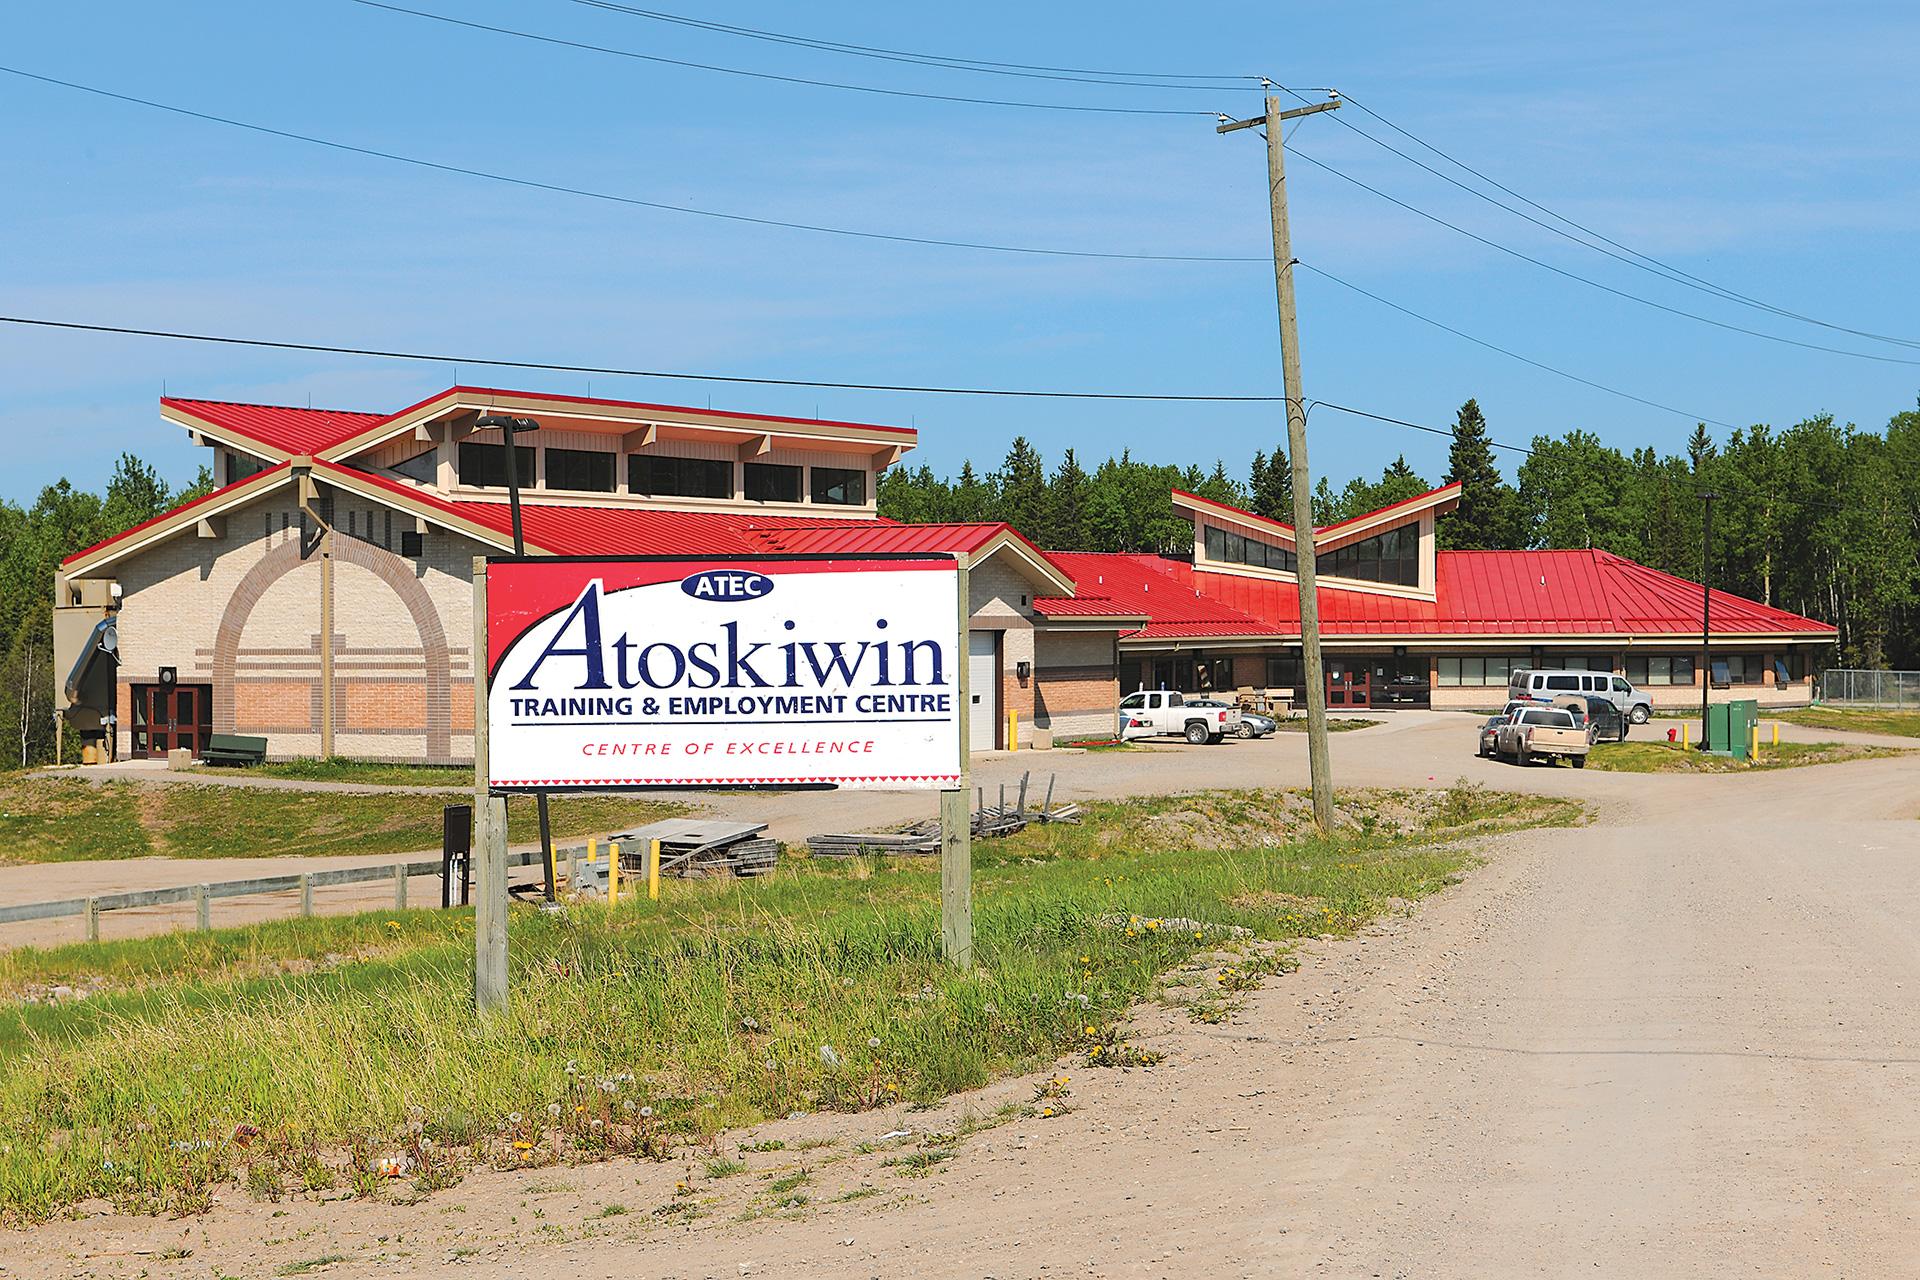 Atoskiwin Training Centre